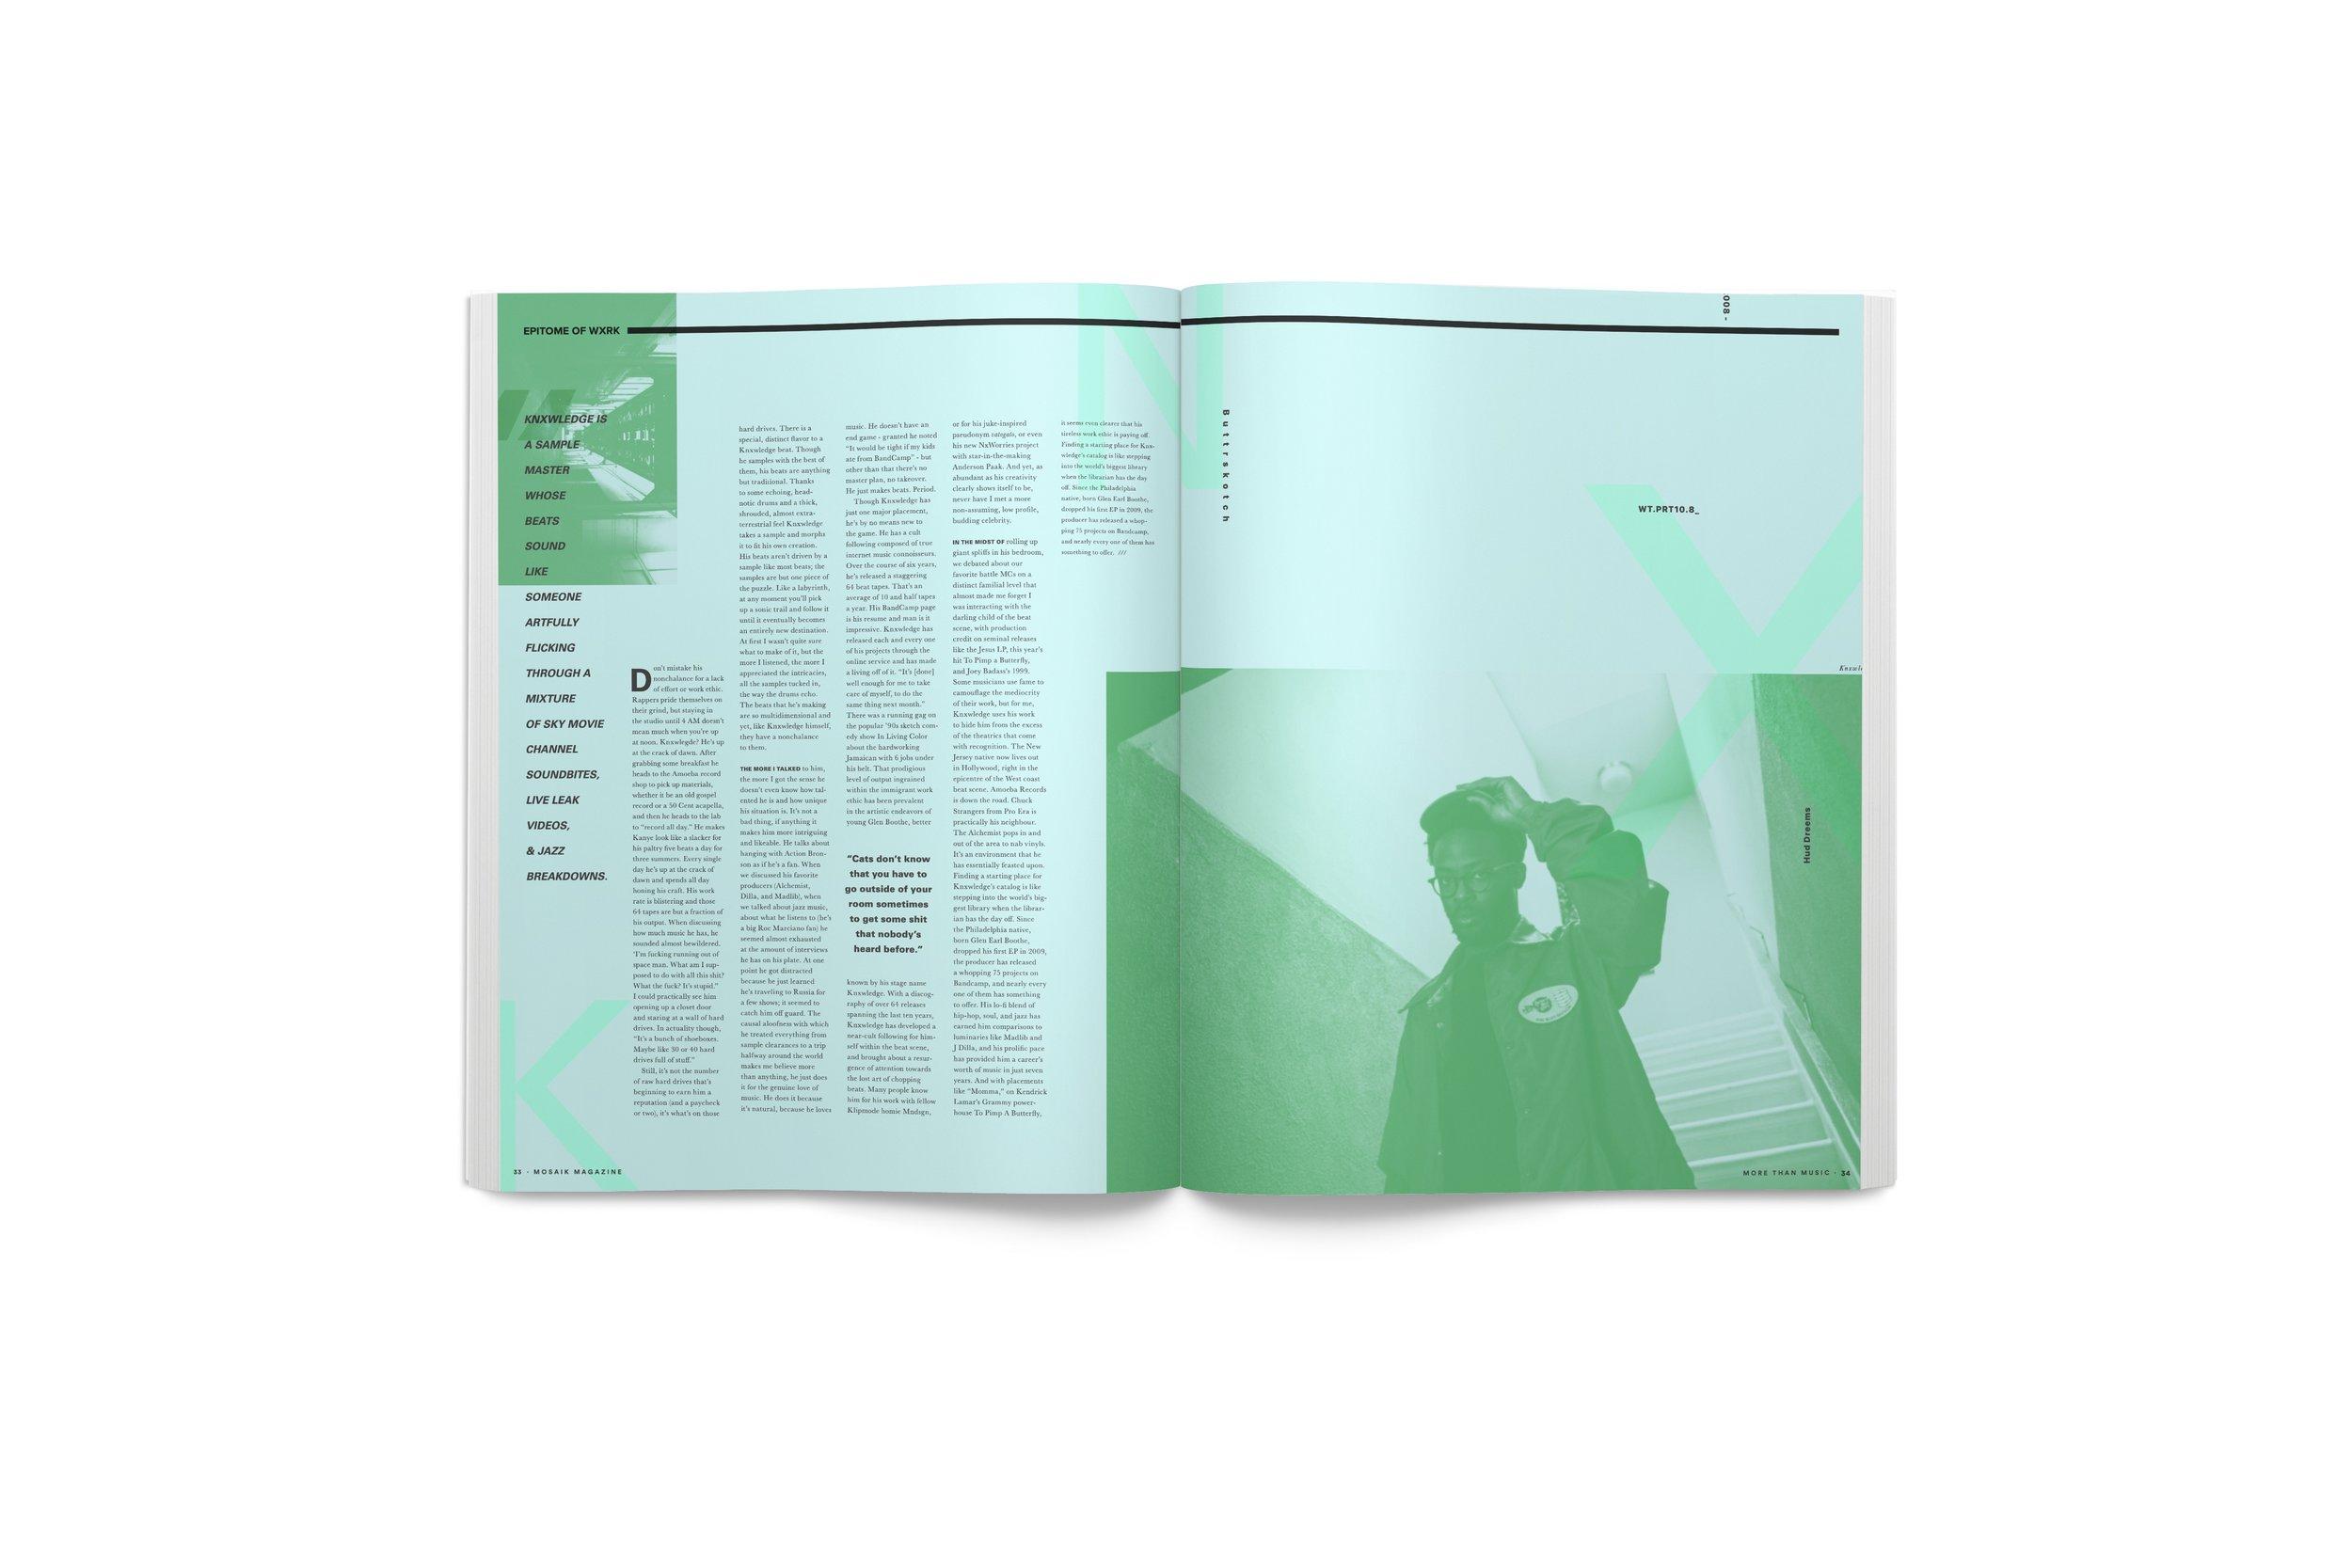 Magazine 0408 2019-03-15 copy.jpeg